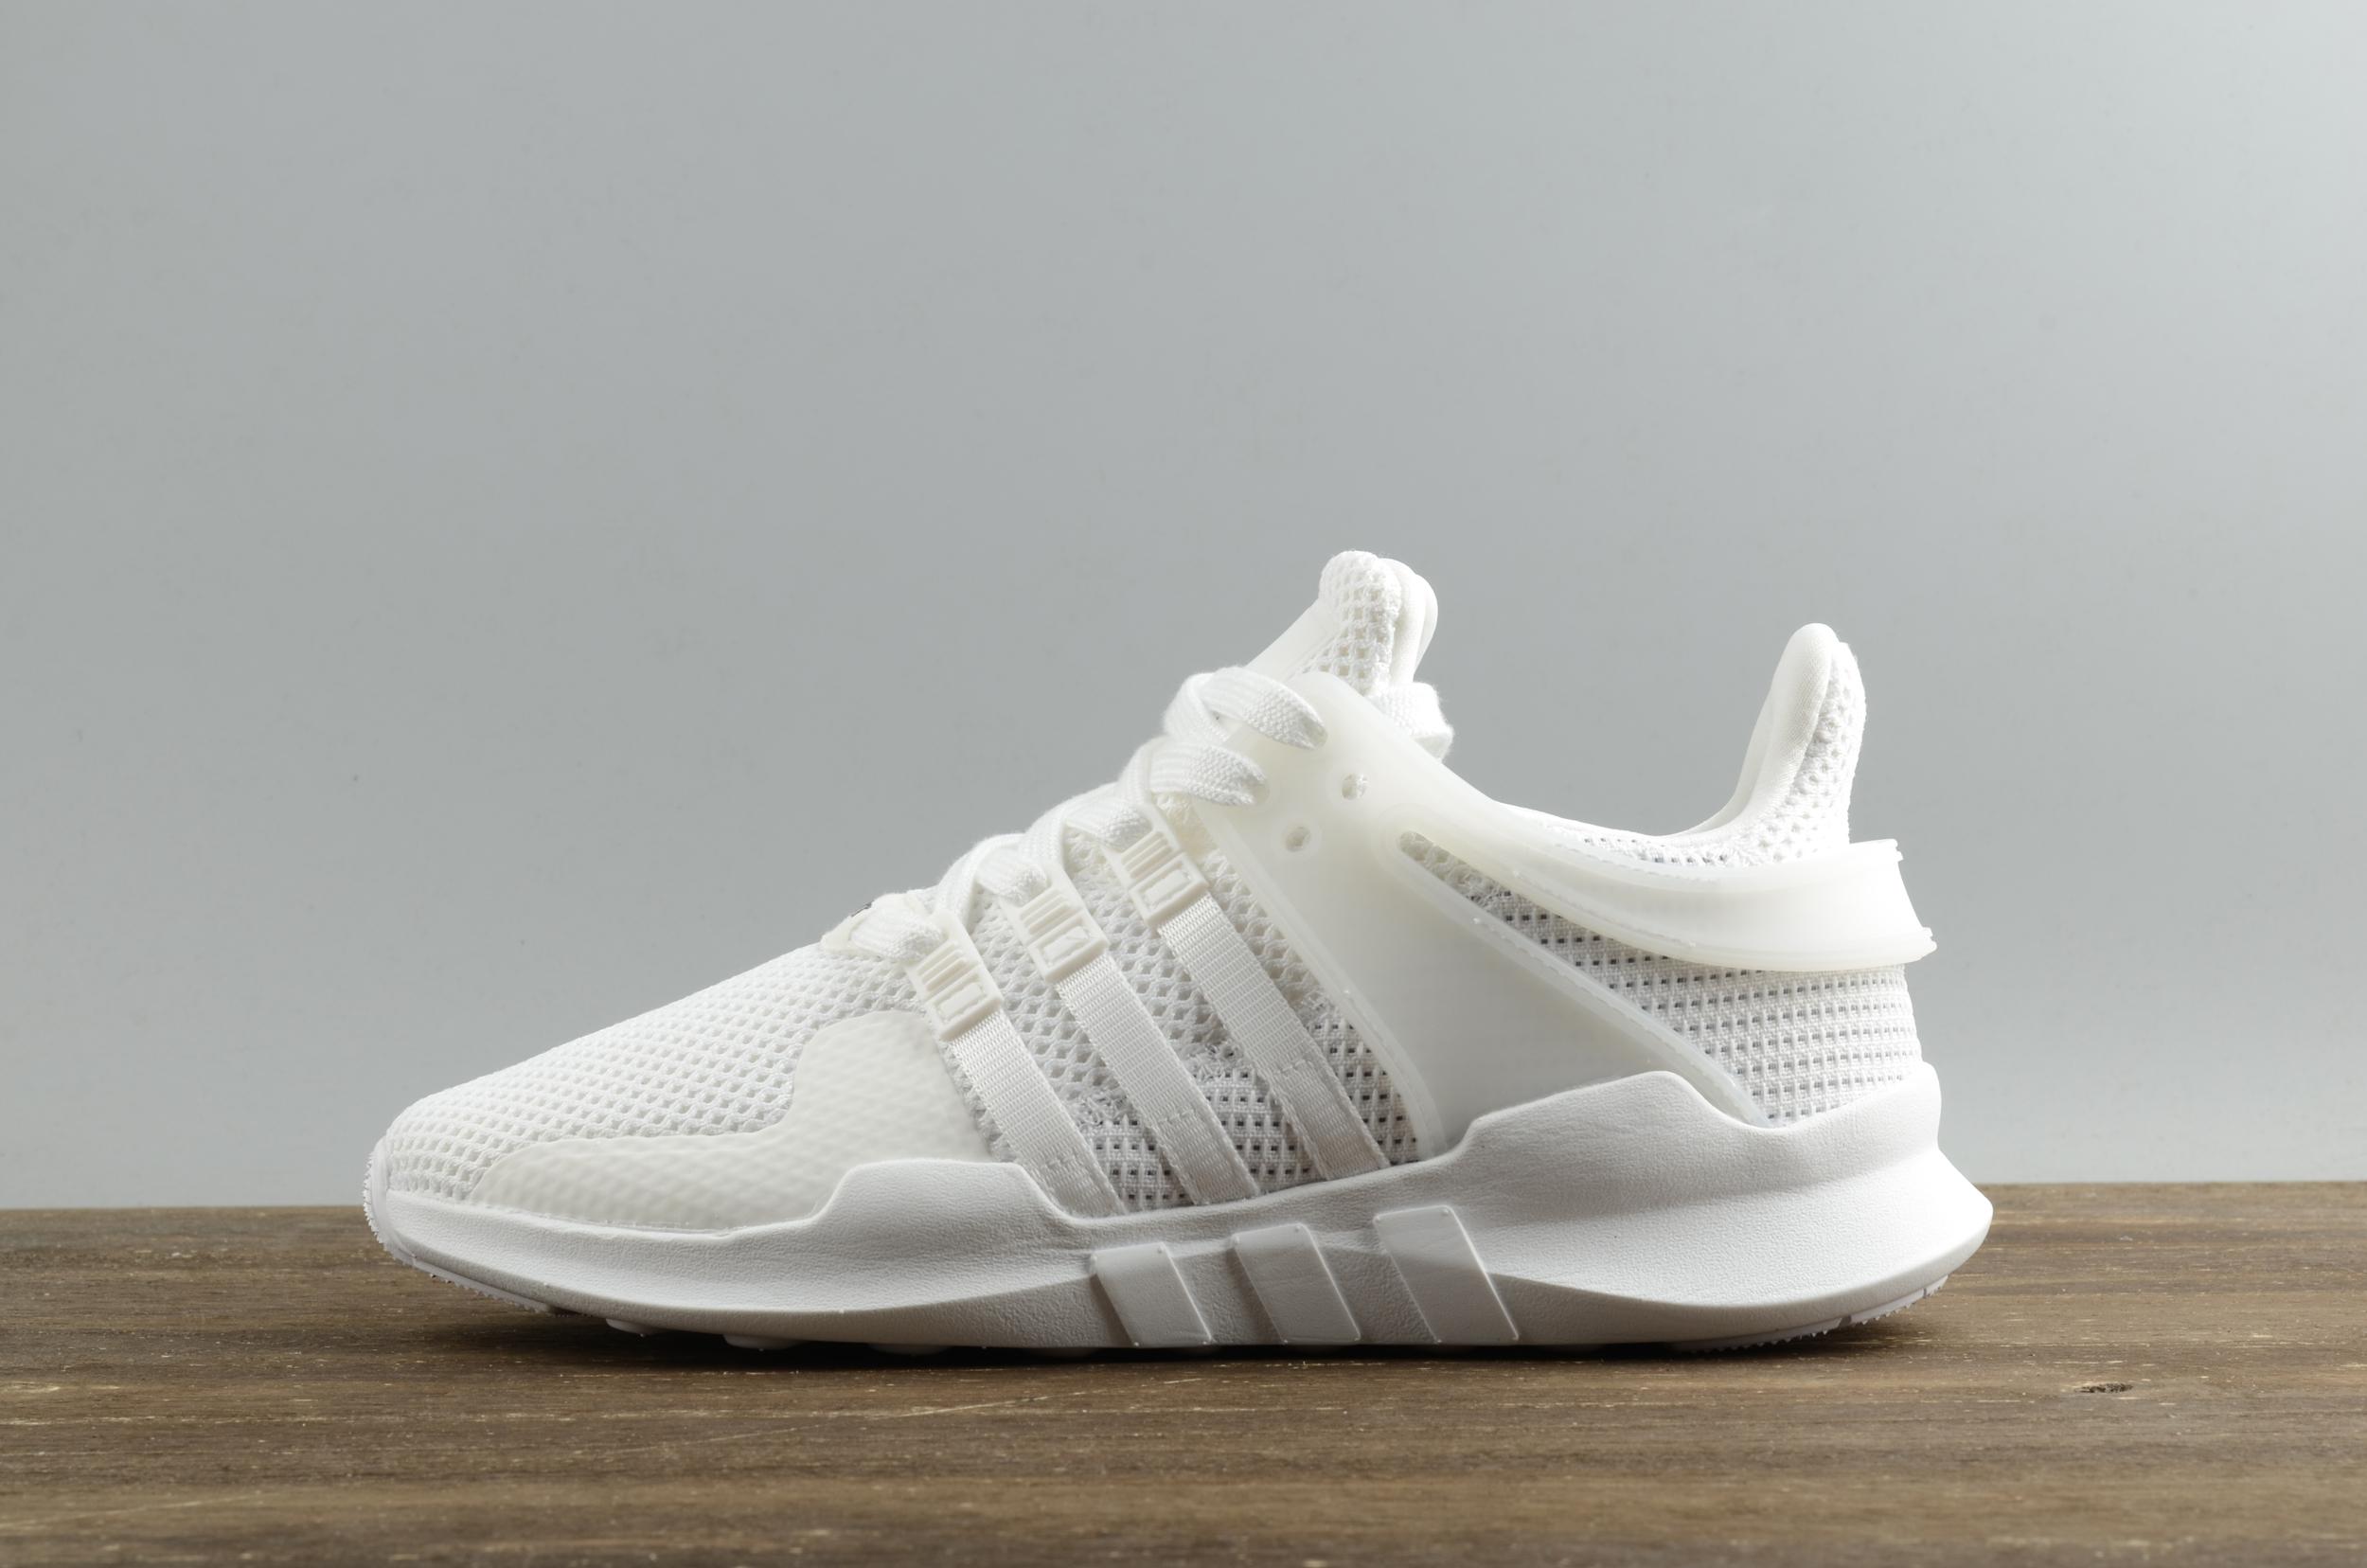 c1072e52bfb ... Adidas EQT support adv pk 93 All white running shoes - Thumbnail 4